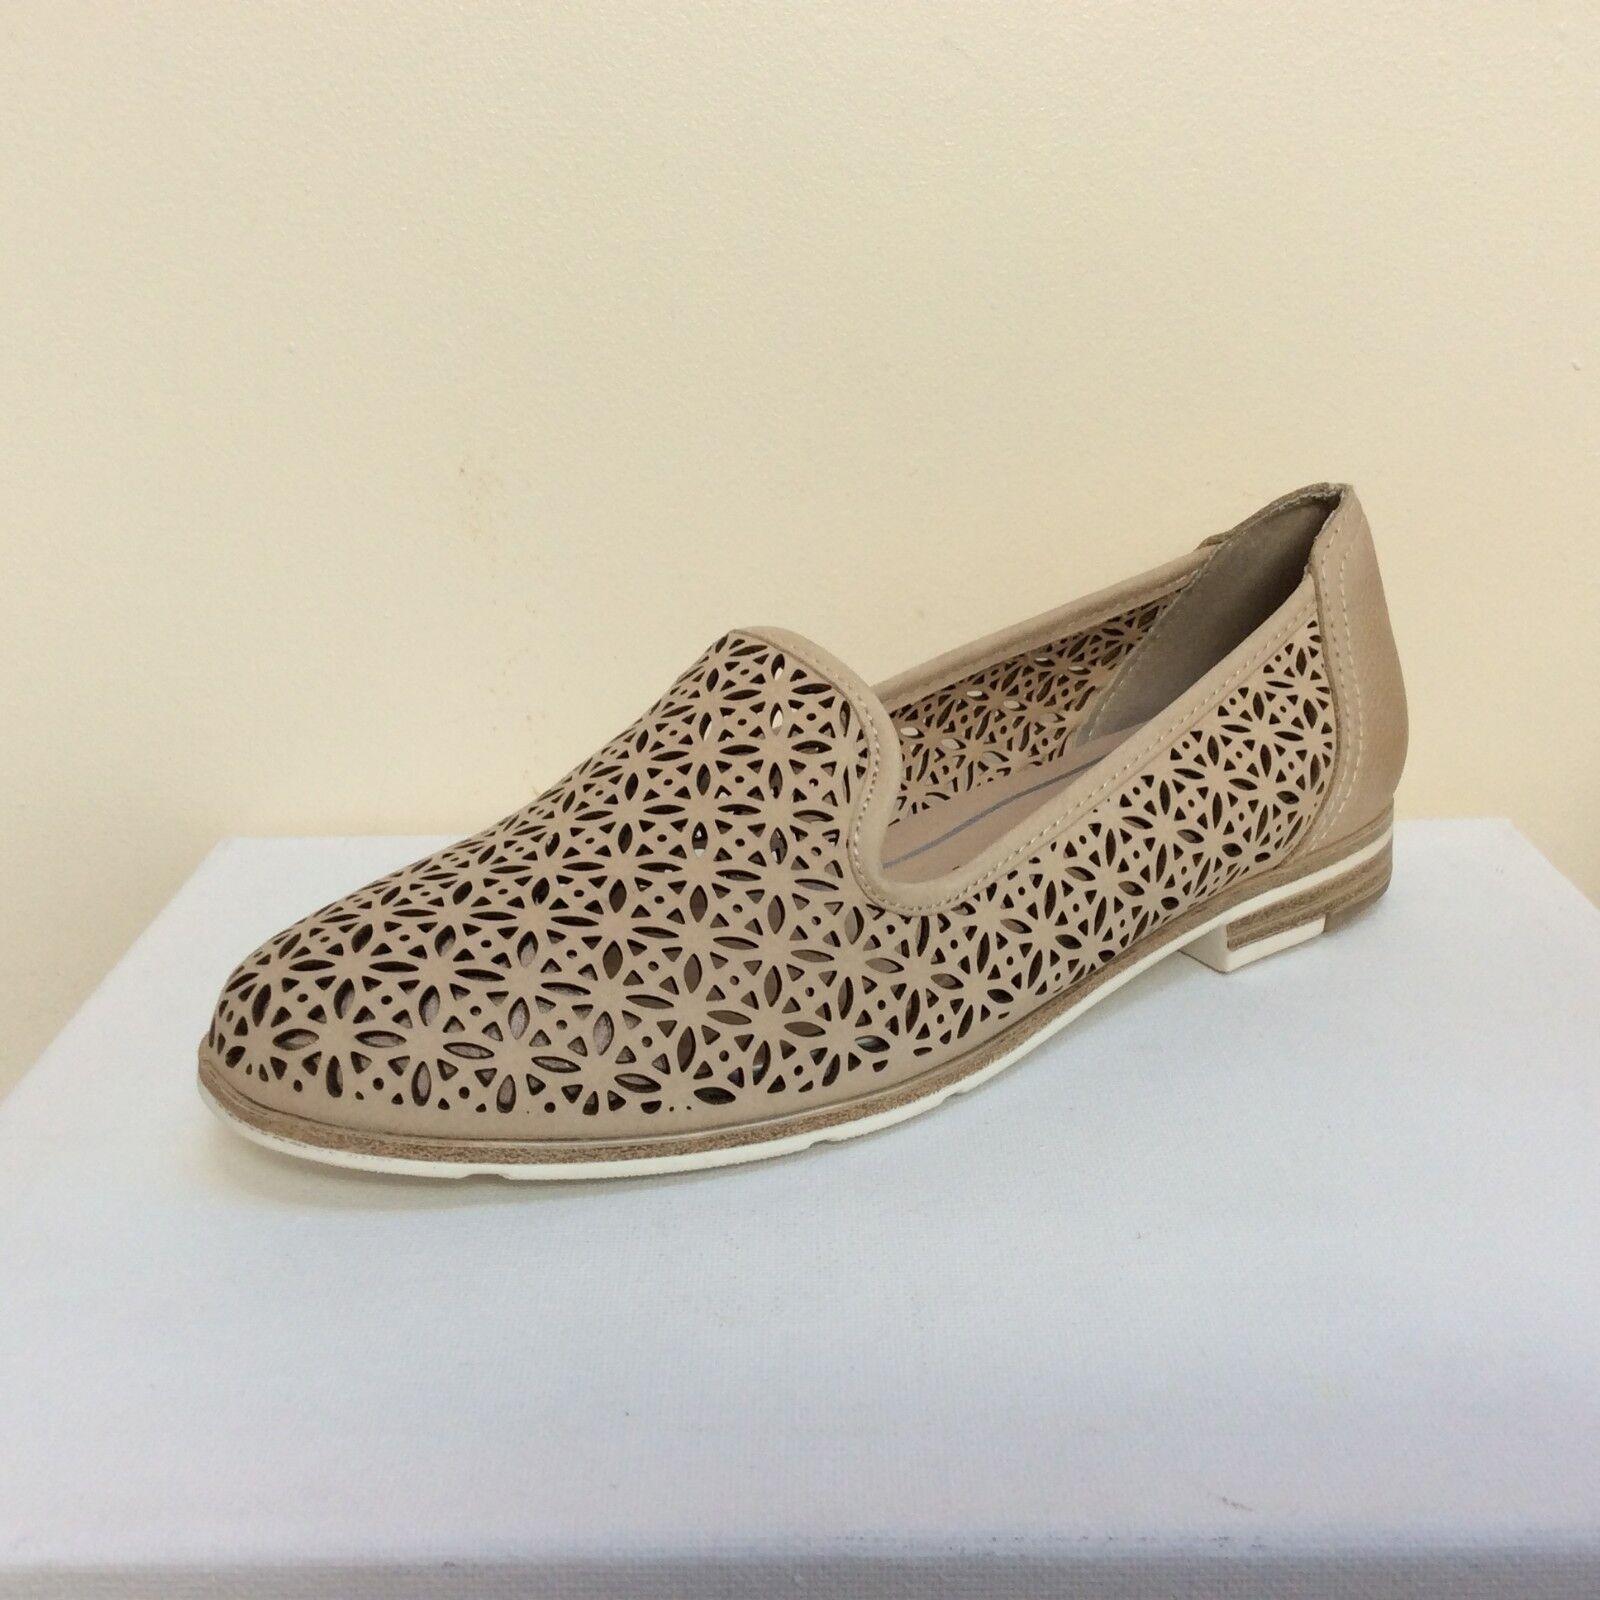 Marco Tozzi Beige Mocassin Style laser cut leather flats, UK 6    UE 39, BNWB